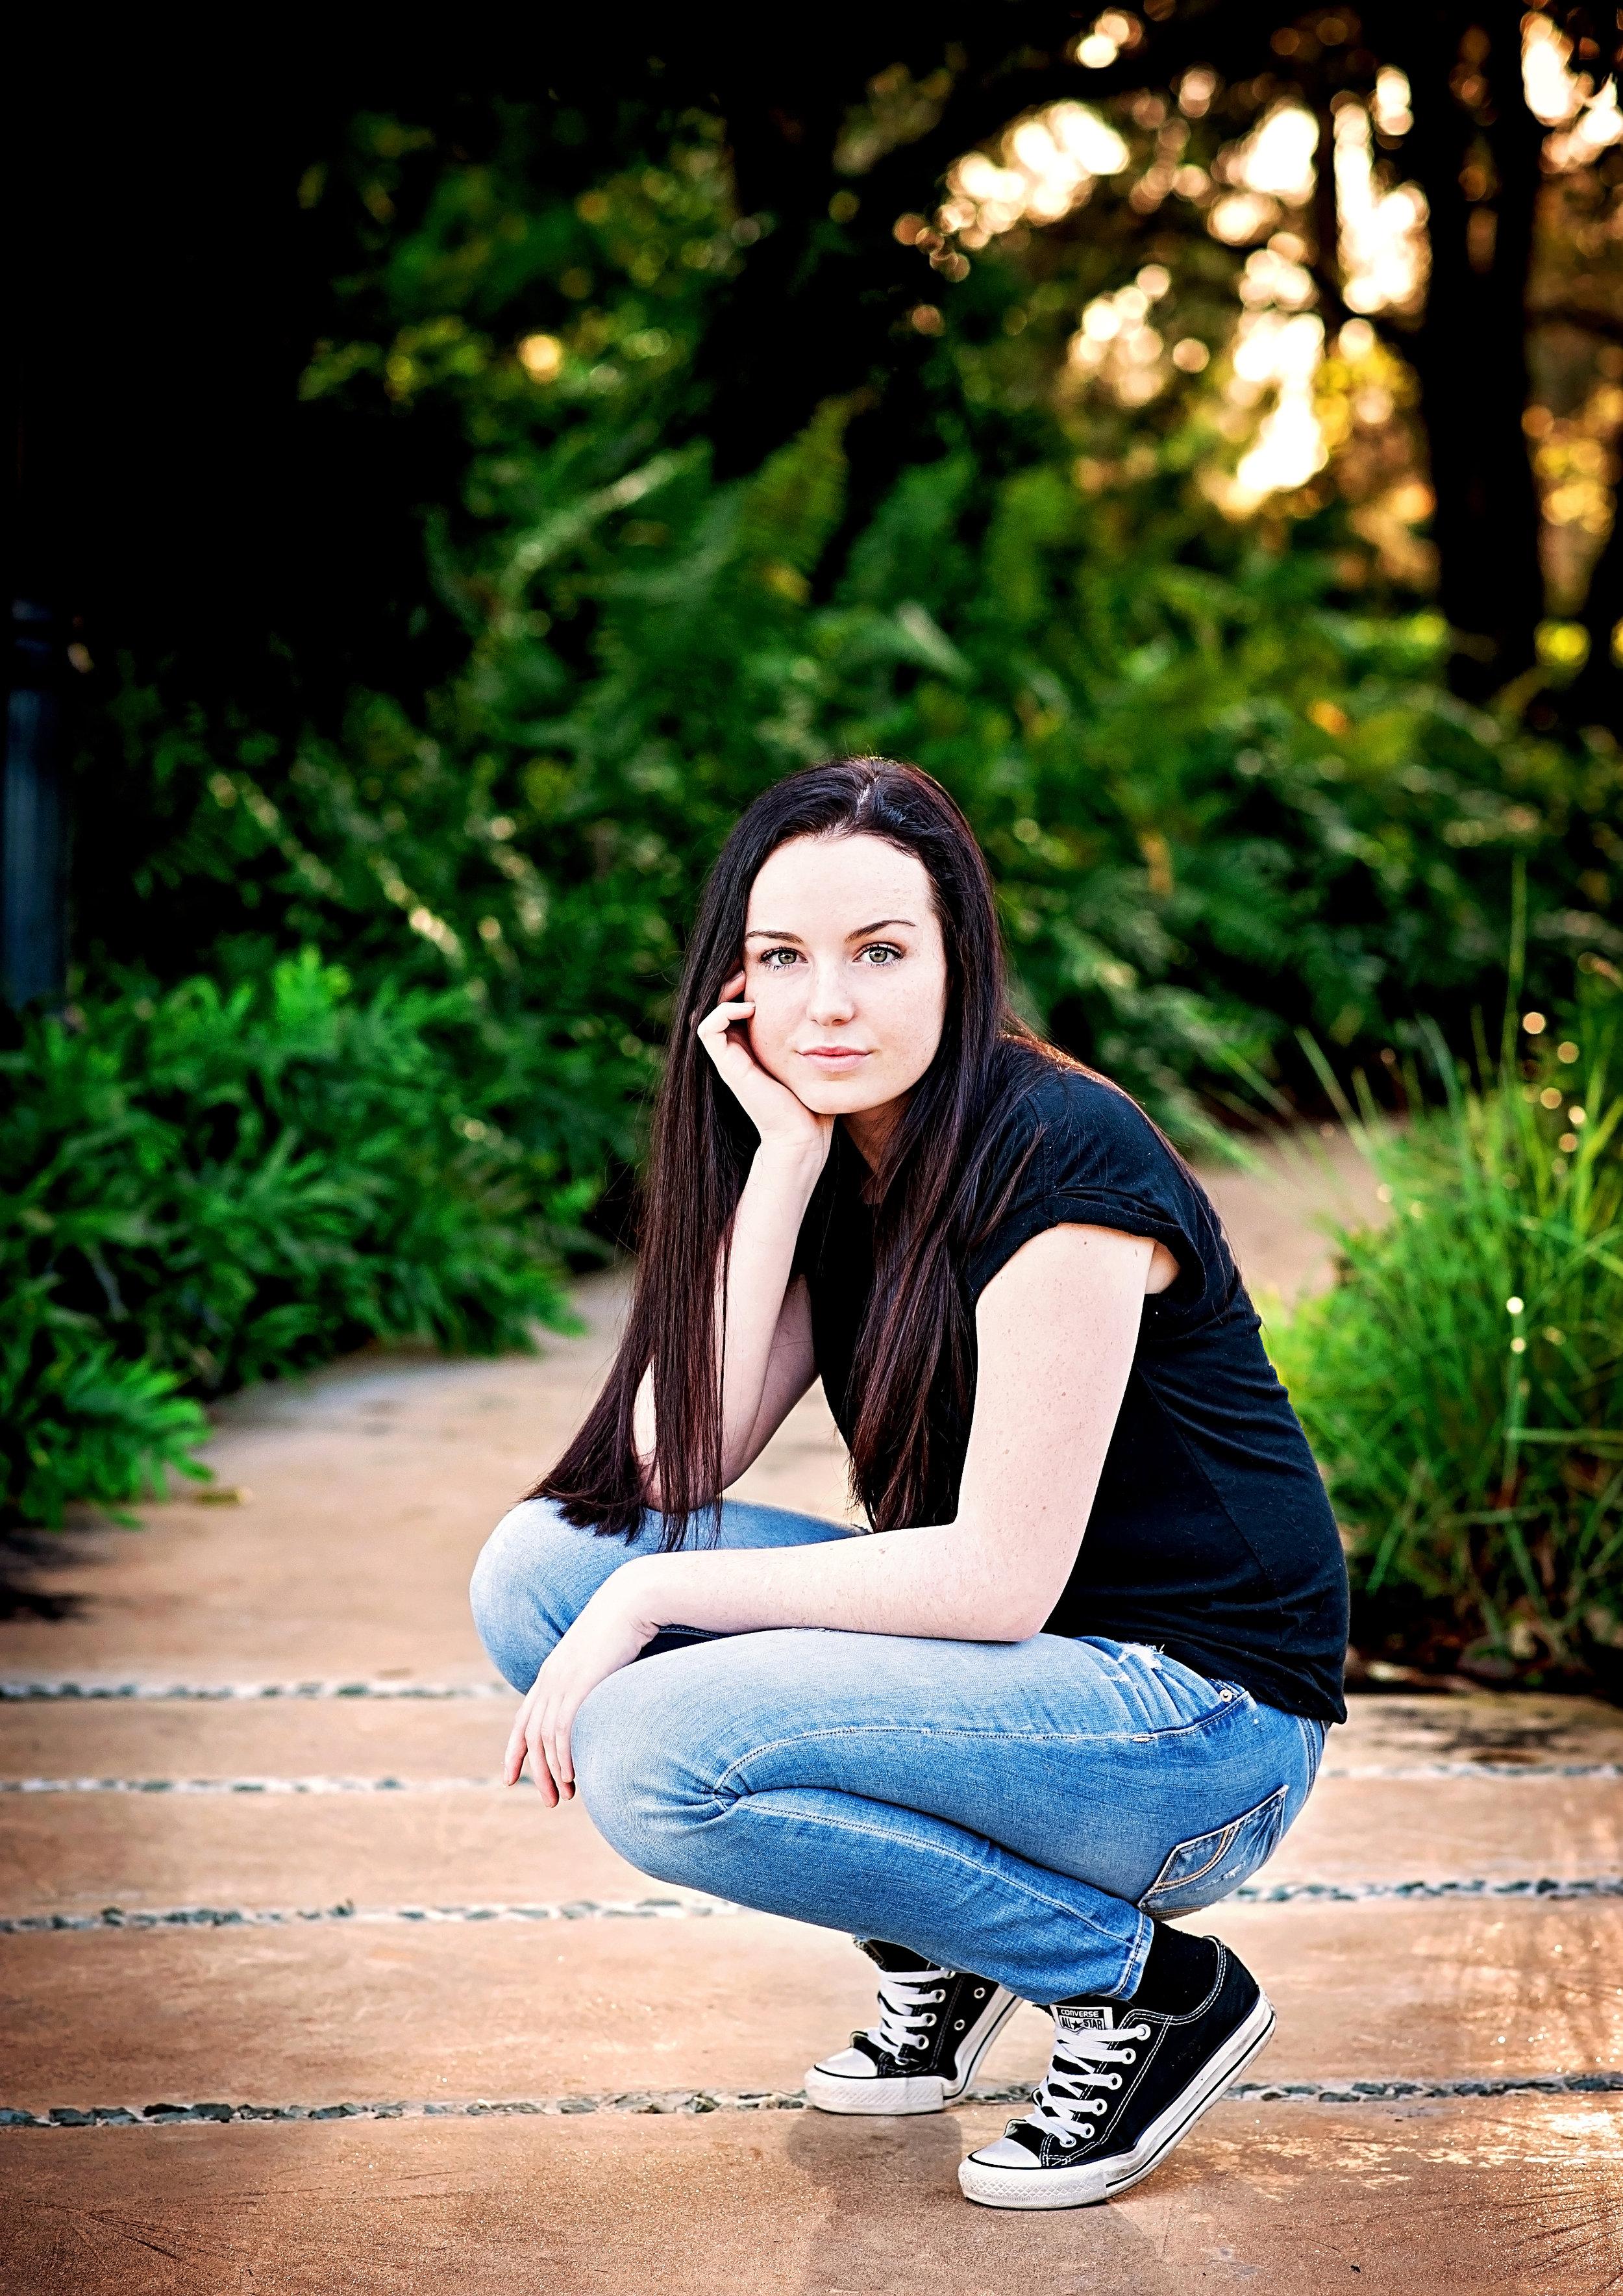 South Florida-photography-professional photographer-photography website-local photographer-teens-high school senior-photos-portrait photographer-50.jpg